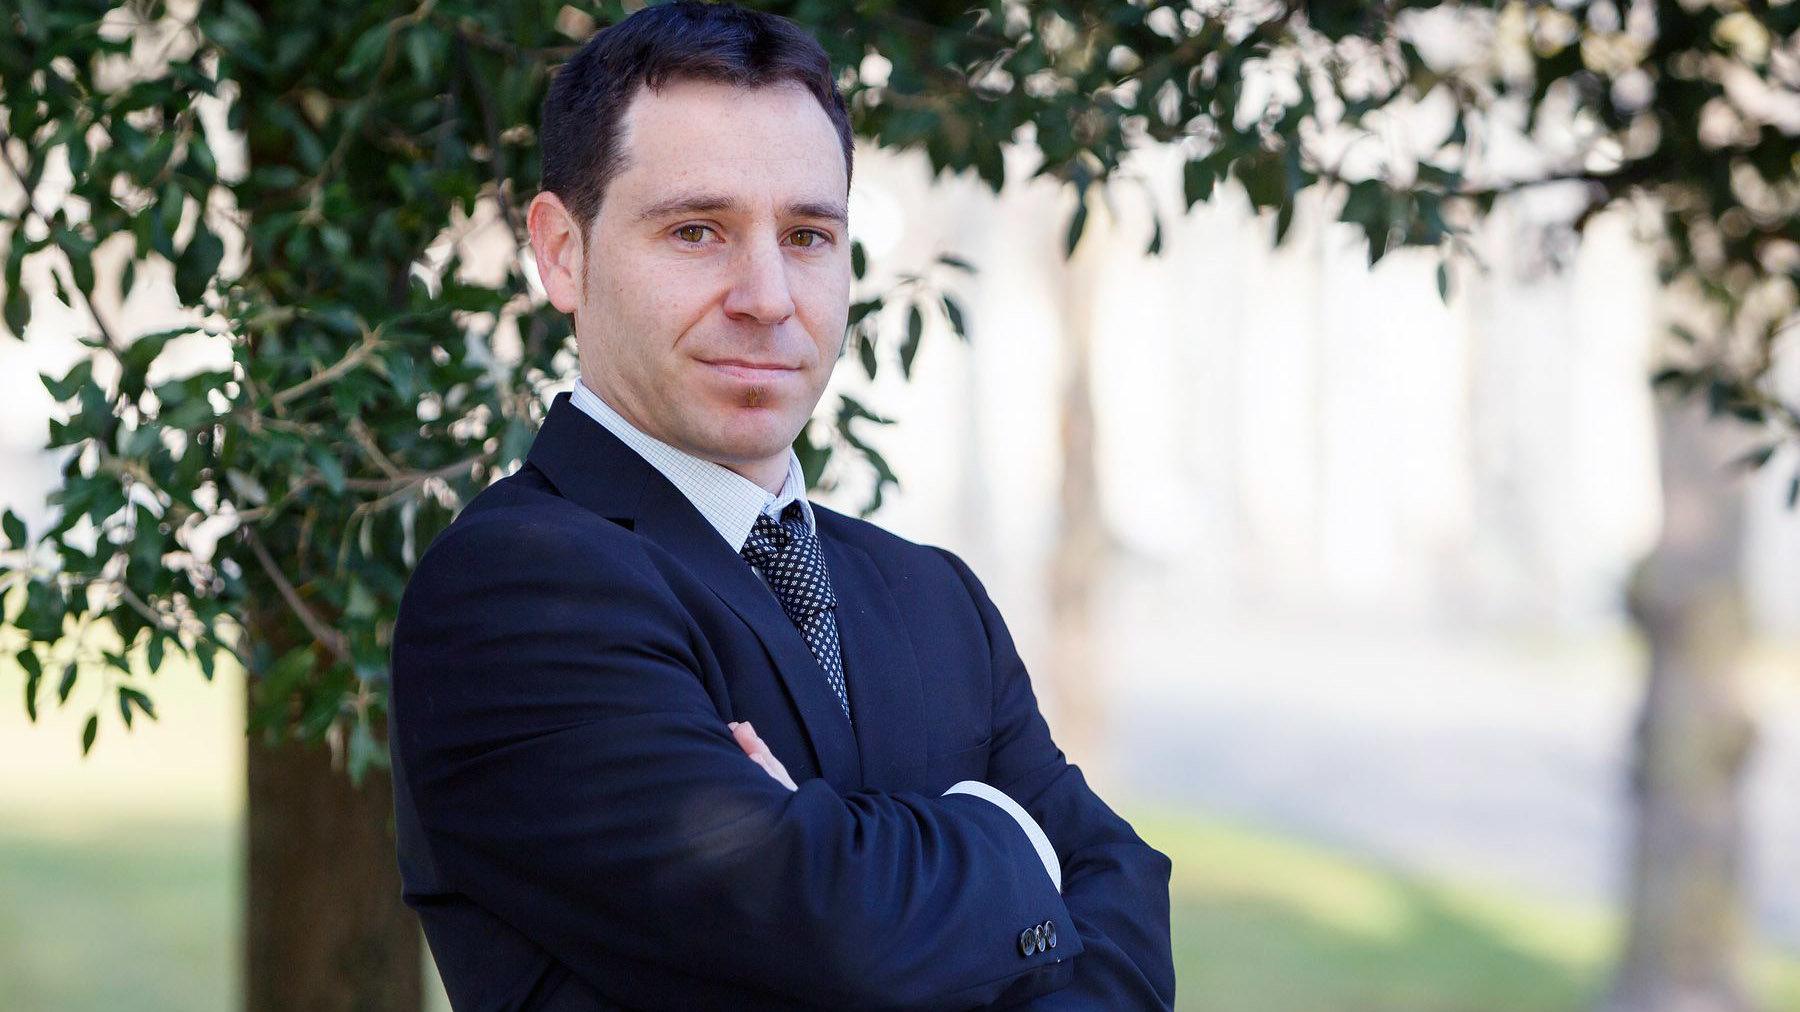 El ingeniero Aitor Urrutia Azcona, en la UPNA.